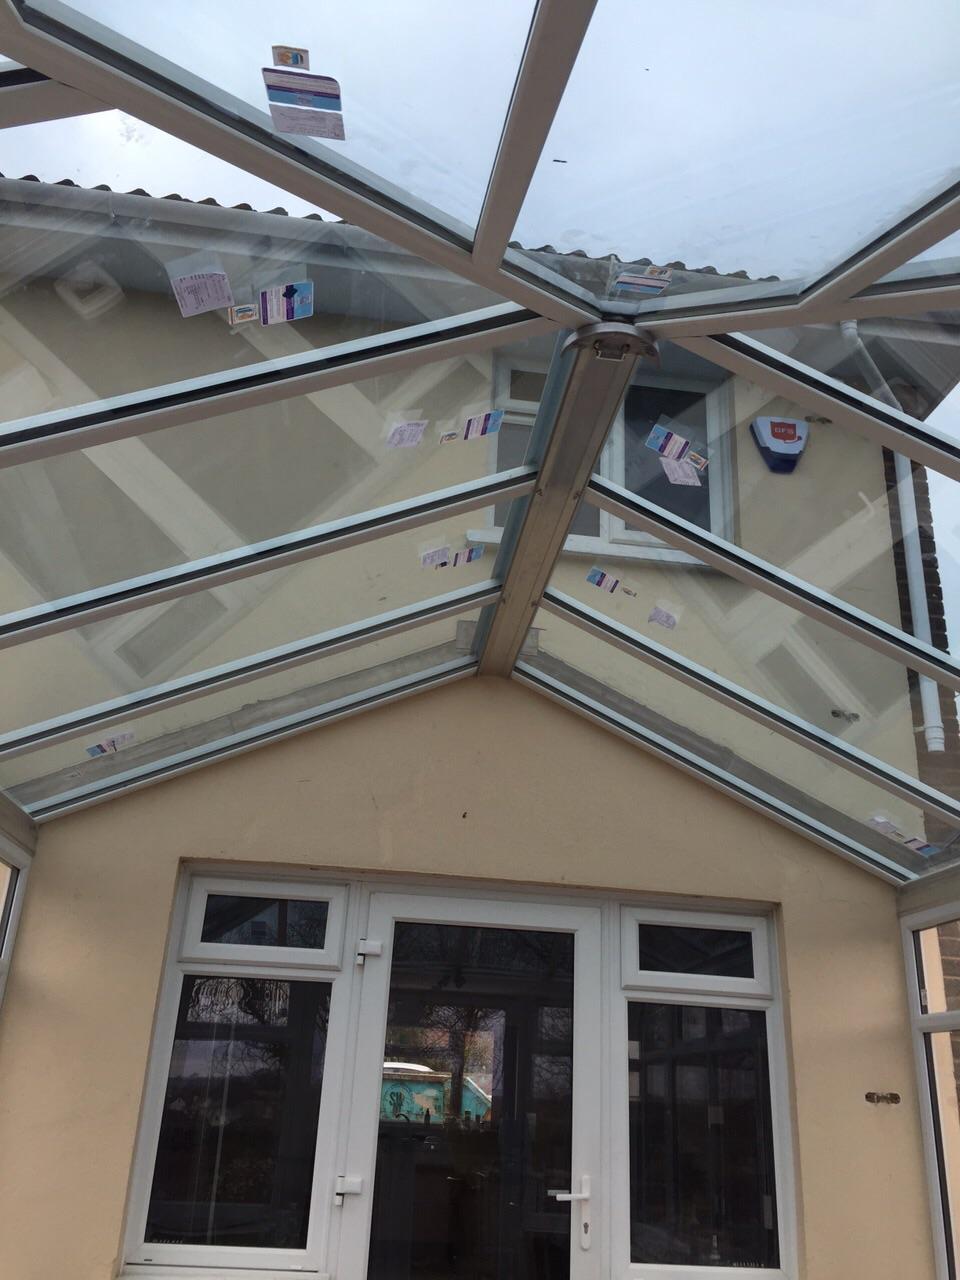 Pvcu Conservatories Custom Designed For Your North Devon Home